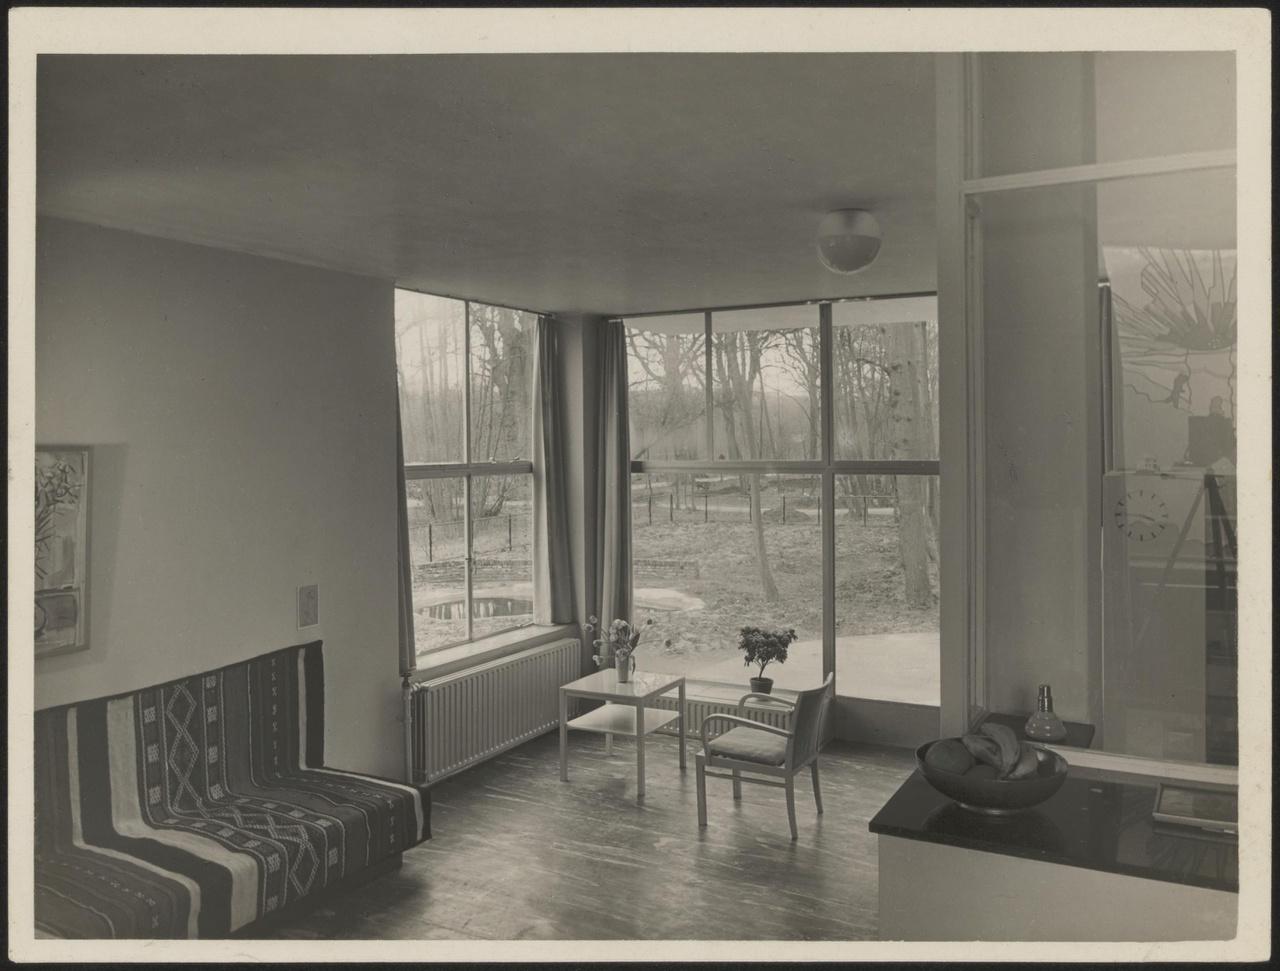 Afbeelding van woning Hillebrand, interieur woonkamer met hoekramen, stoel en tafeltje